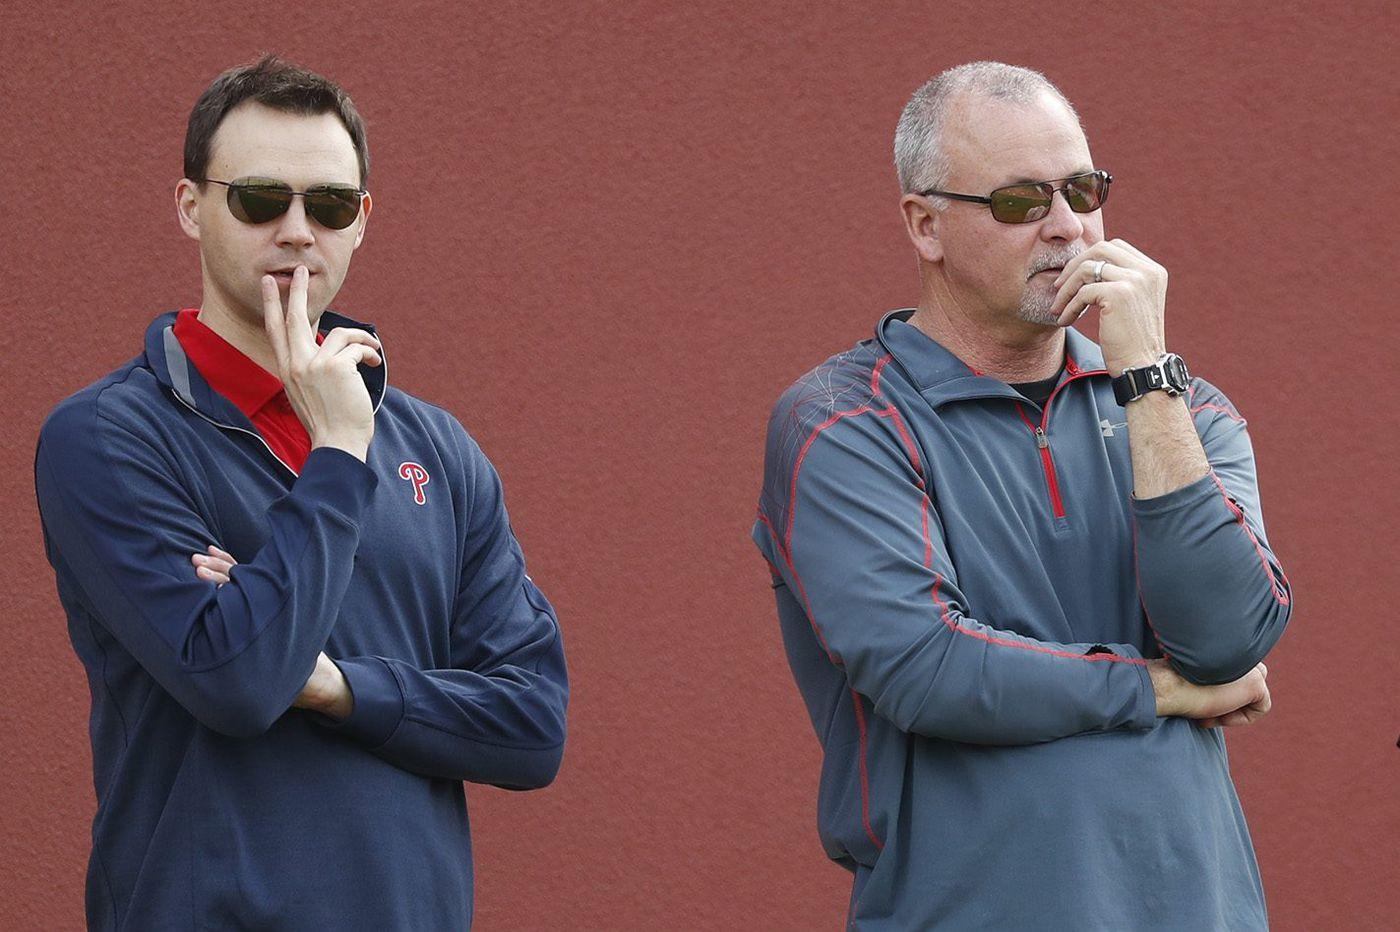 Joe Jordan's departure another sign of Phillies' changing ways | Bob Brookover